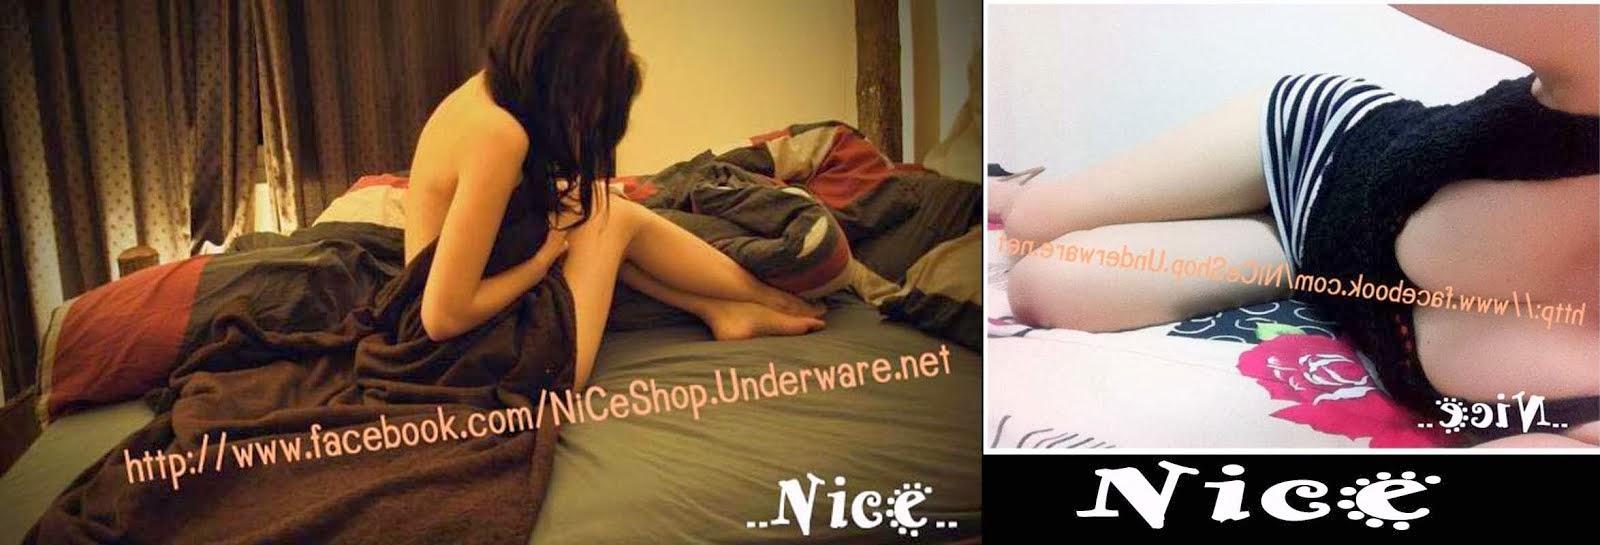 NiCe Shopss.net ♫ ยินดีต้อนรับค๊